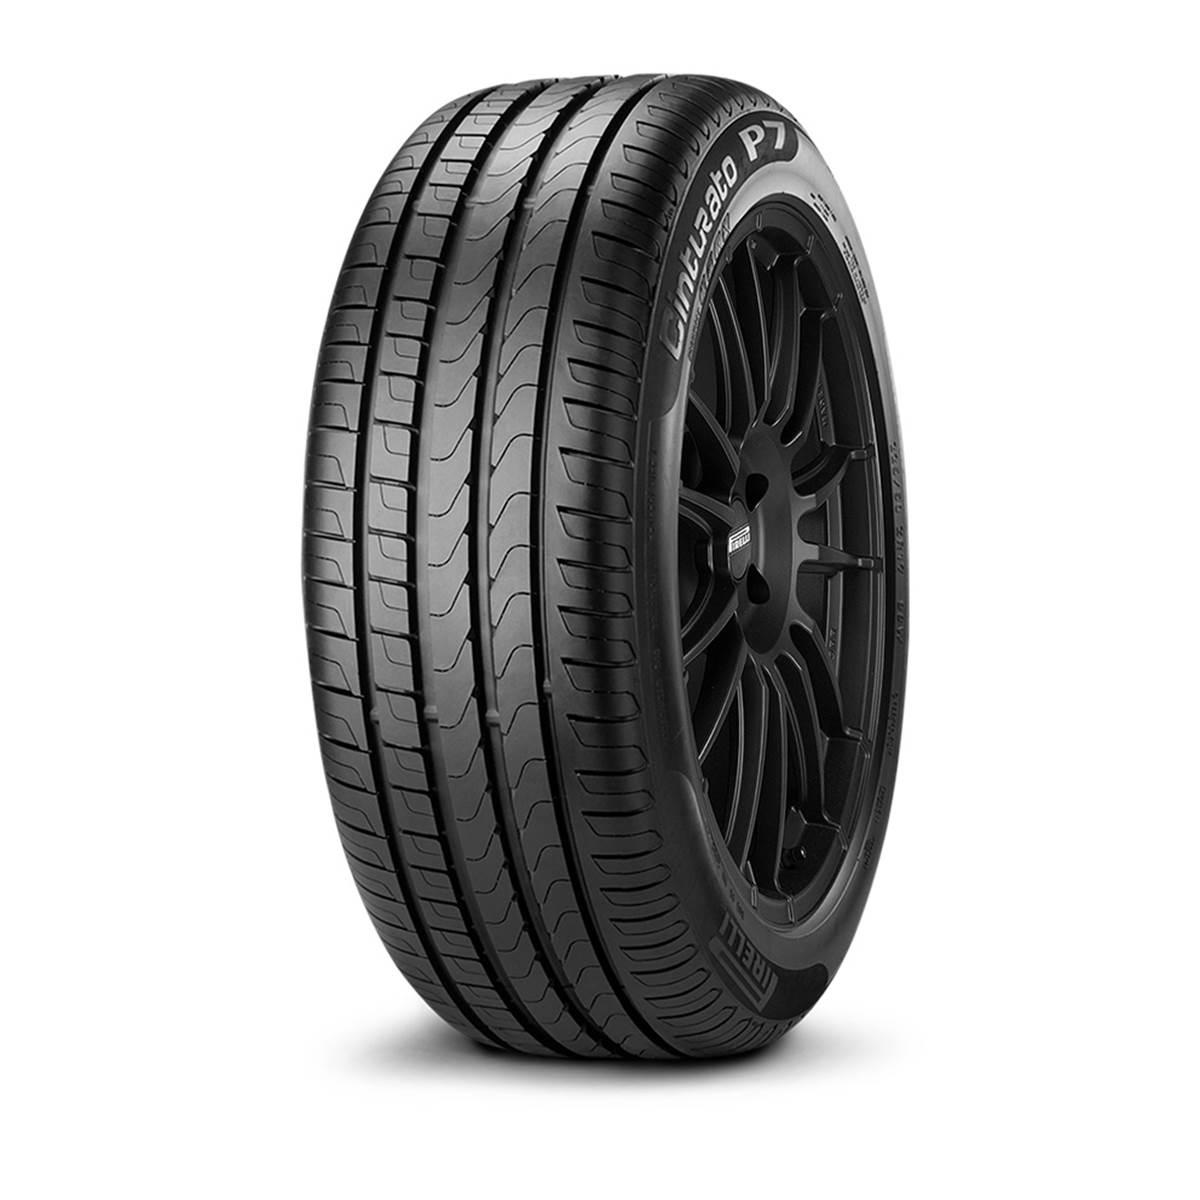 Pneu Pirelli 205/50R16 87W Cinturato P7